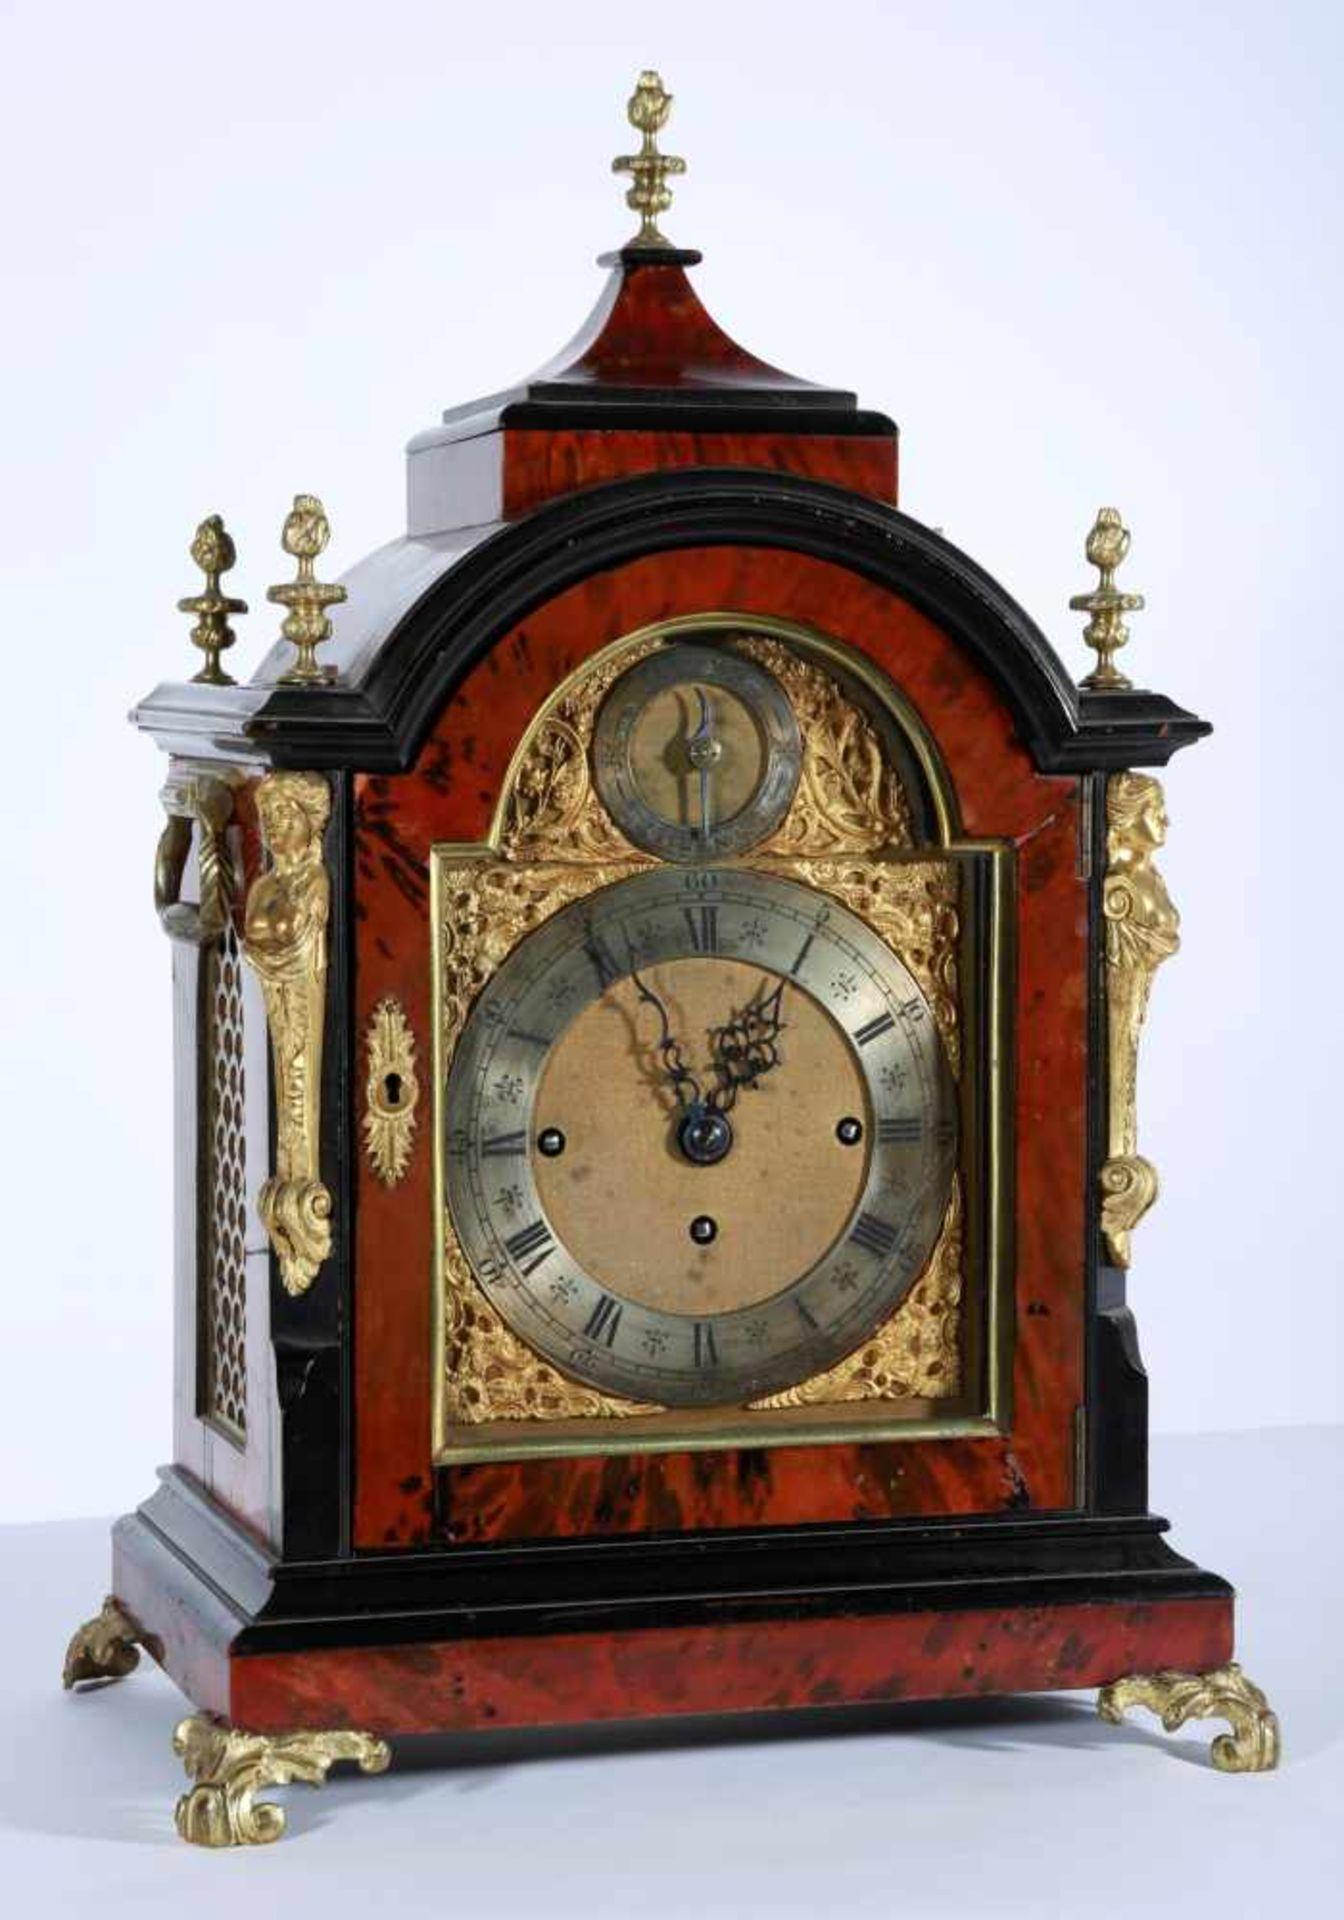 Los 20 - English carillon clock - Musical clock England, London, circa 1780, dial labeled Wells Piccadilly,